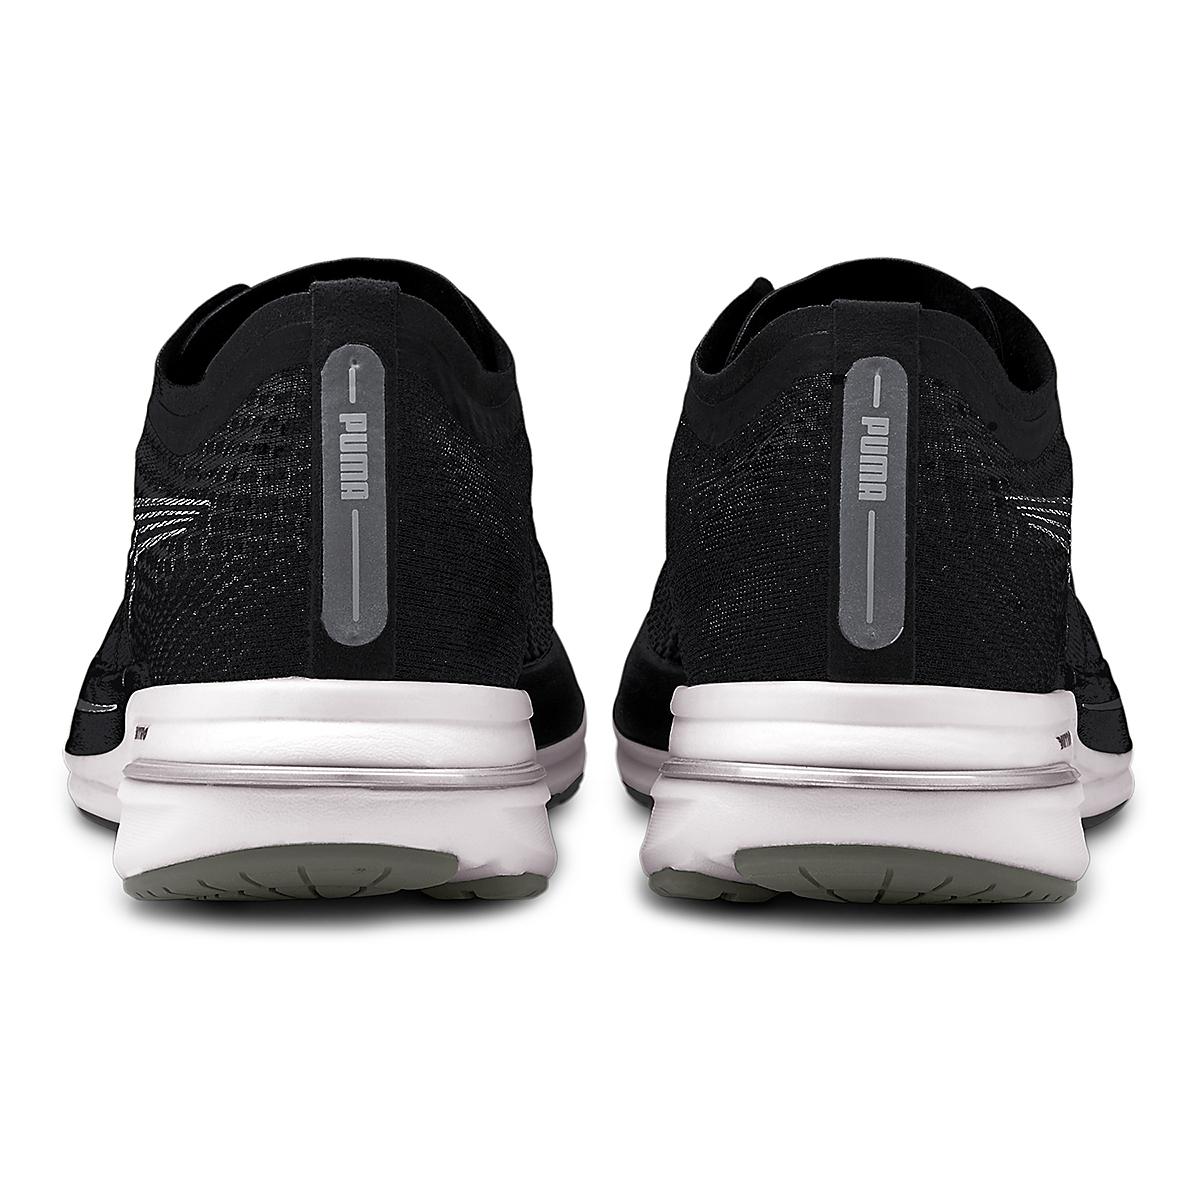 Men's Puma Deviate Nitro Running Shoe - Color: Puma Black-Puma Silver - Size: 7 - Width: Regular, Puma Black-Puma Silver, large, image 3